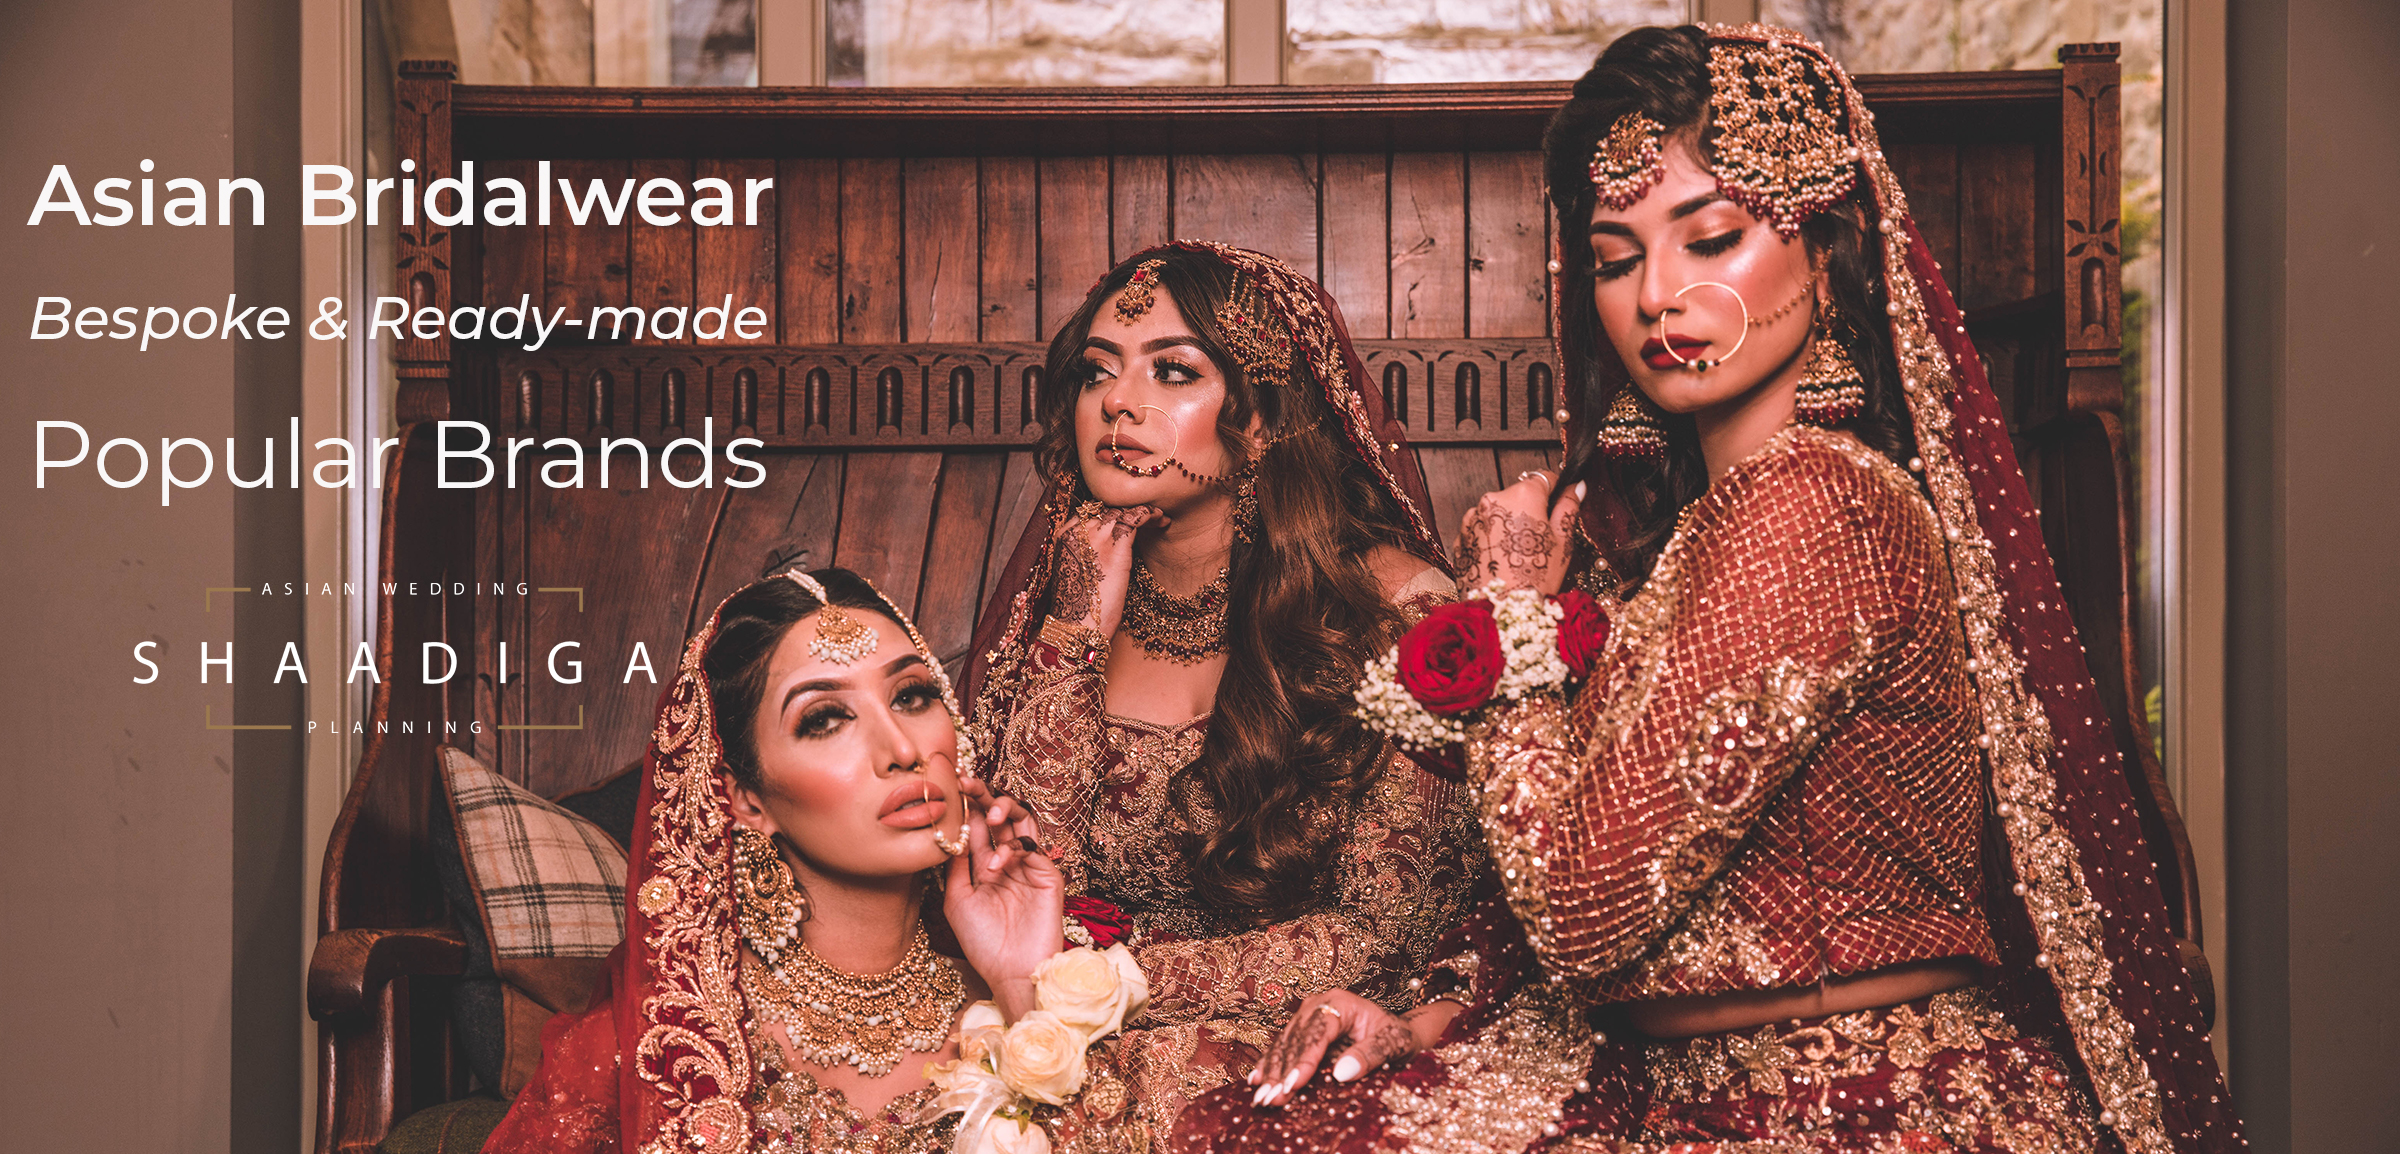 Asian Bridalwear by Popular Brands